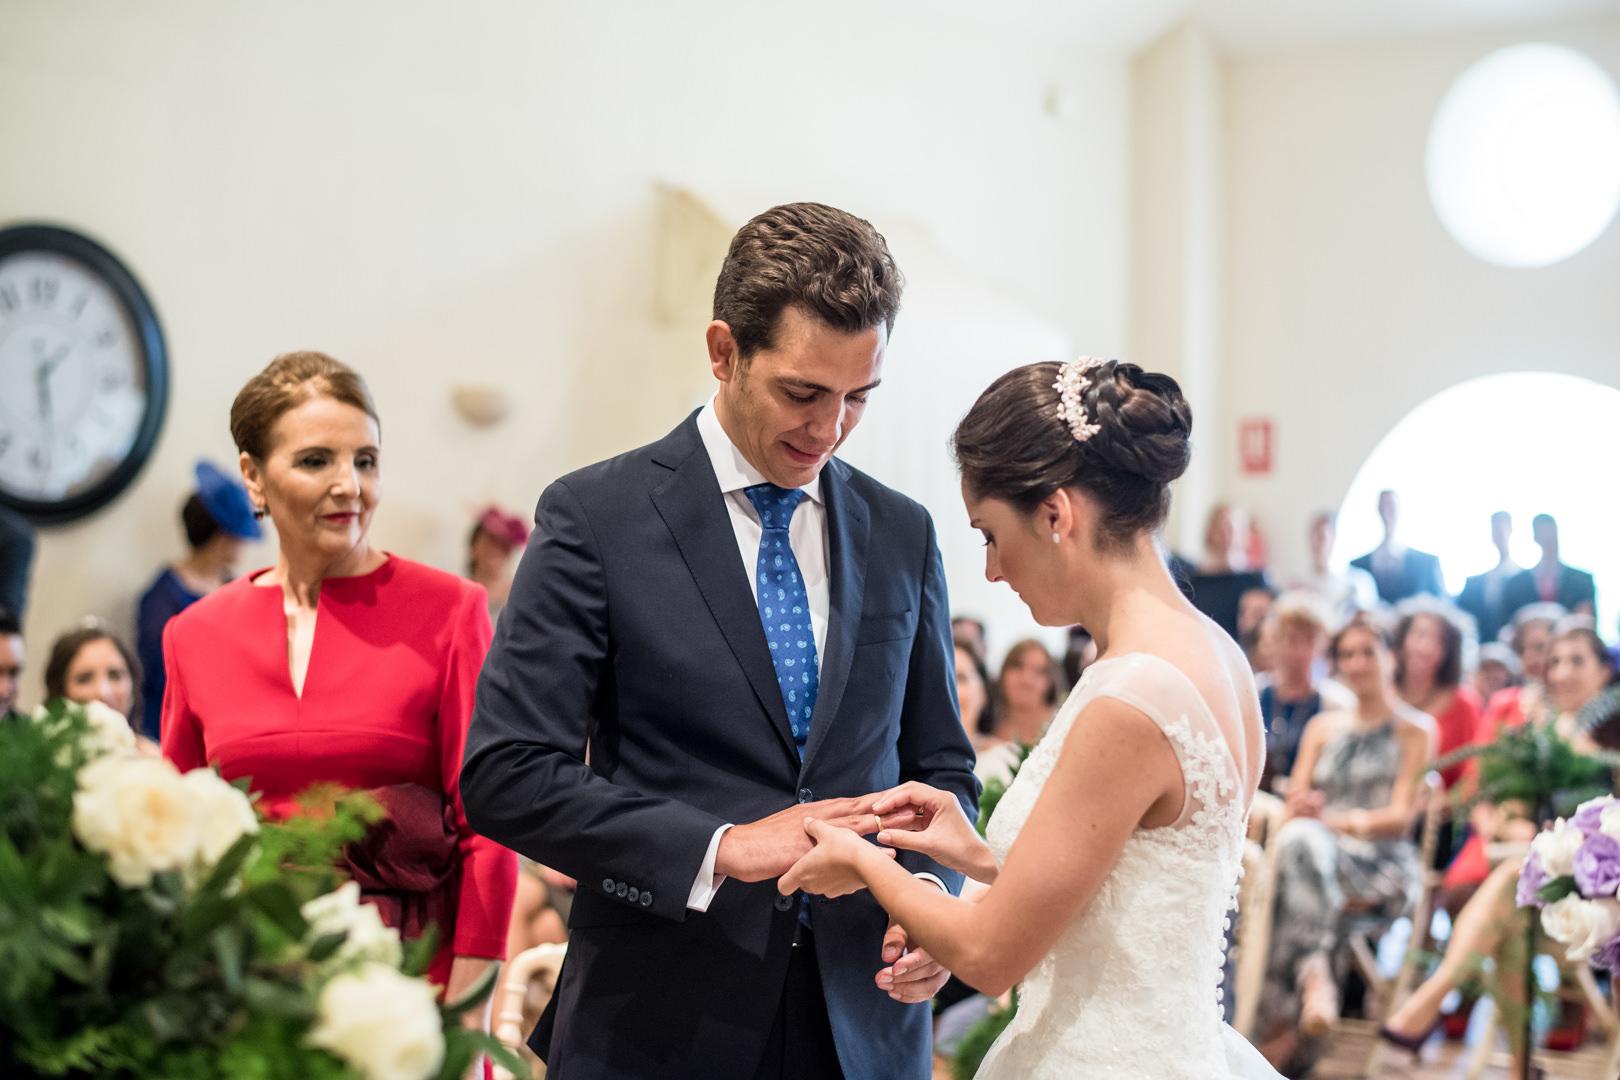 Boda-Hacienda-LOrigen-Pepe-Maria-engagement-Rafael-Torres-fotografo-bodas-sevilla-madrid-barcelona-wedding-photographer--20.jpg